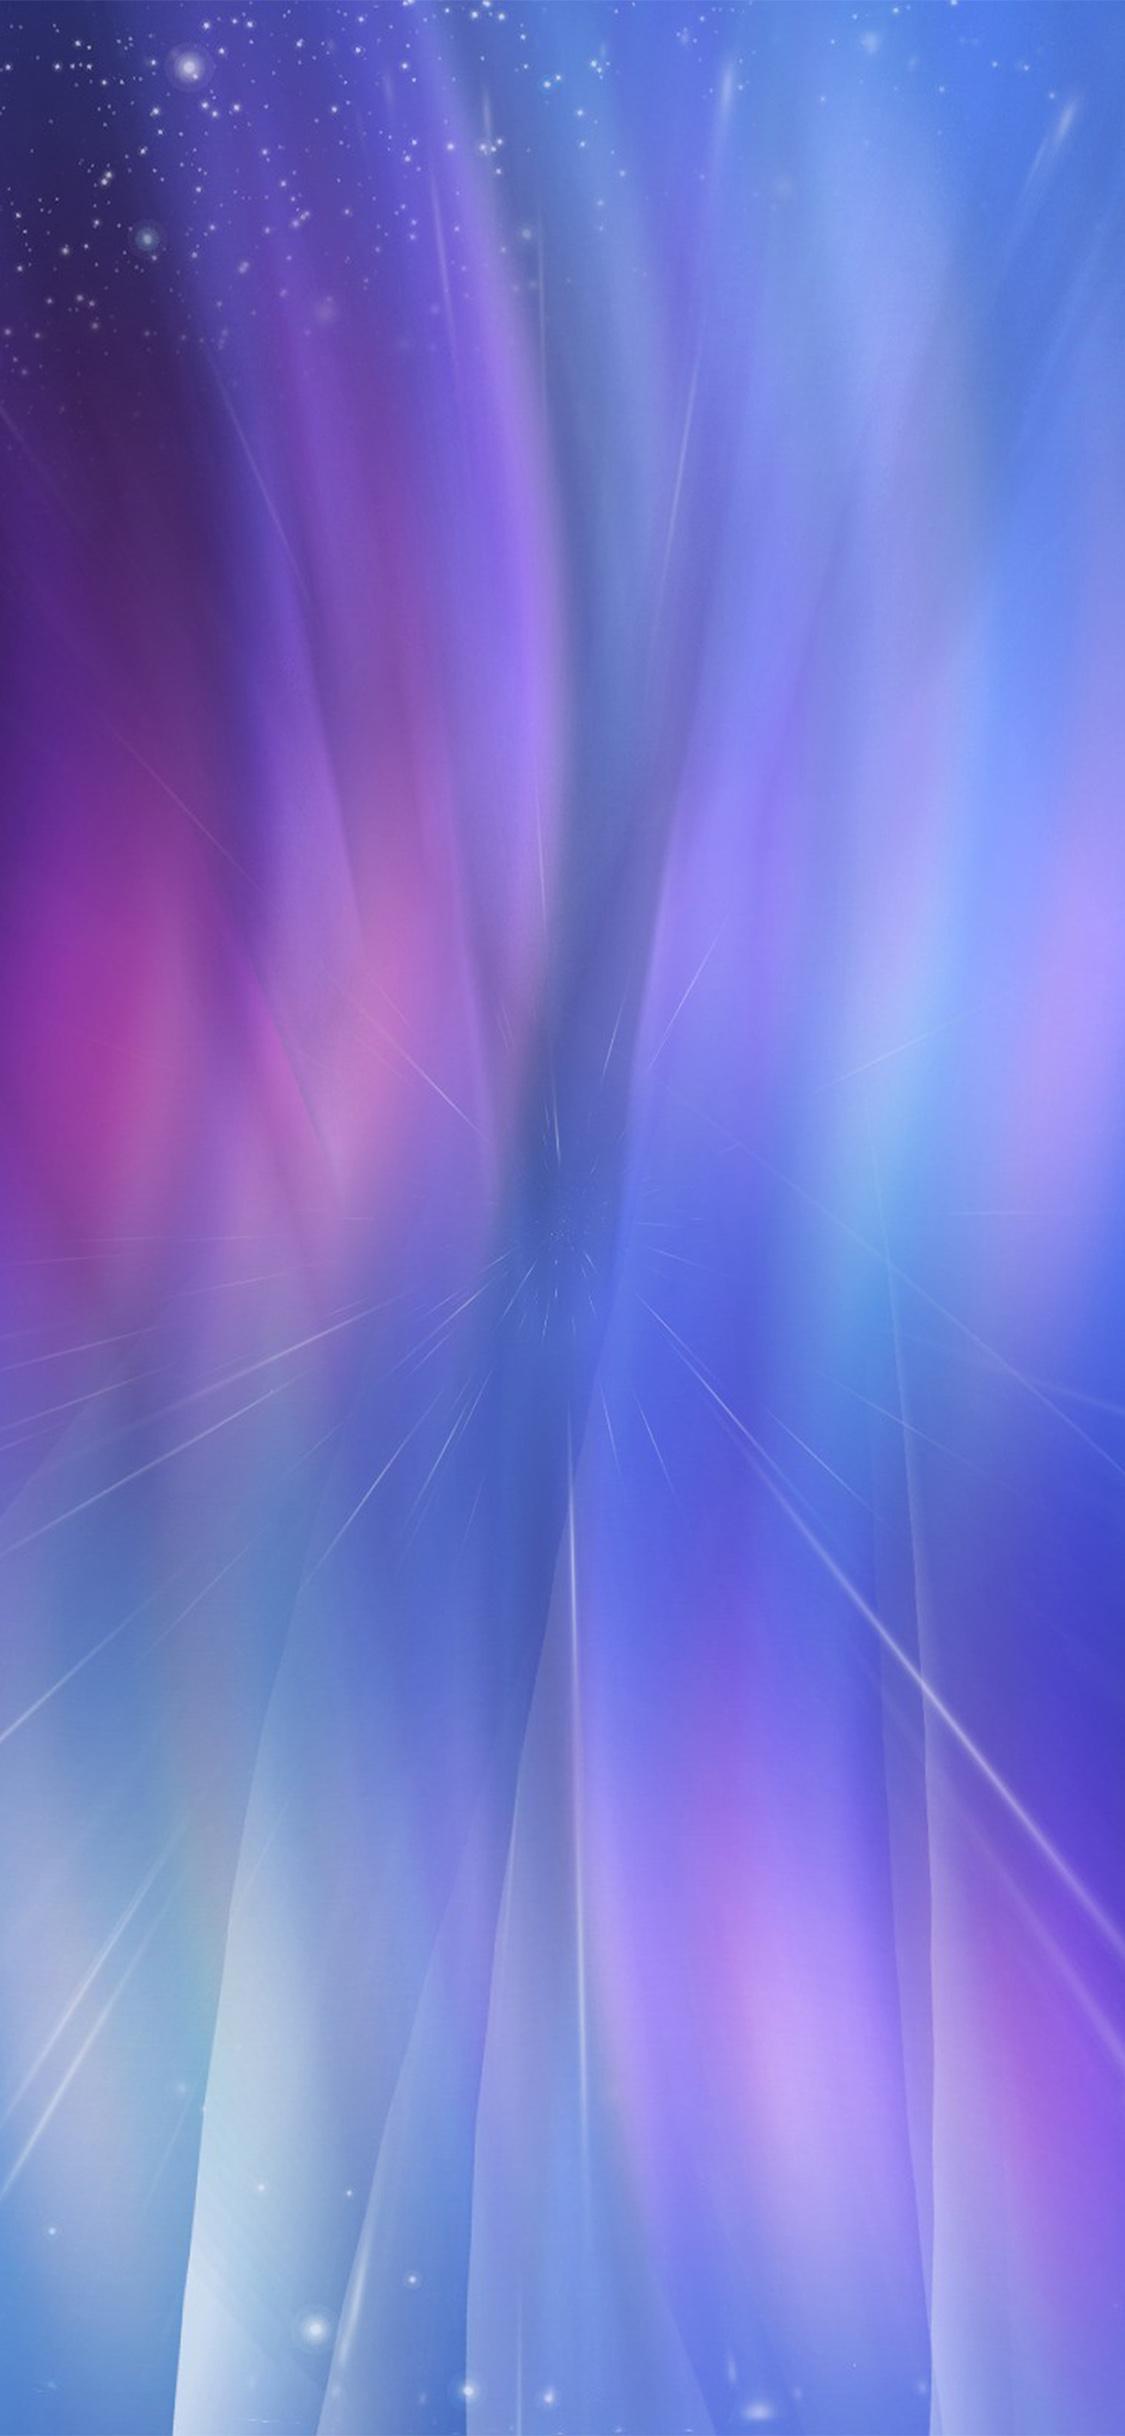 Vp16 Fantasy Purple Blue Abstract Pattern Wallpaper